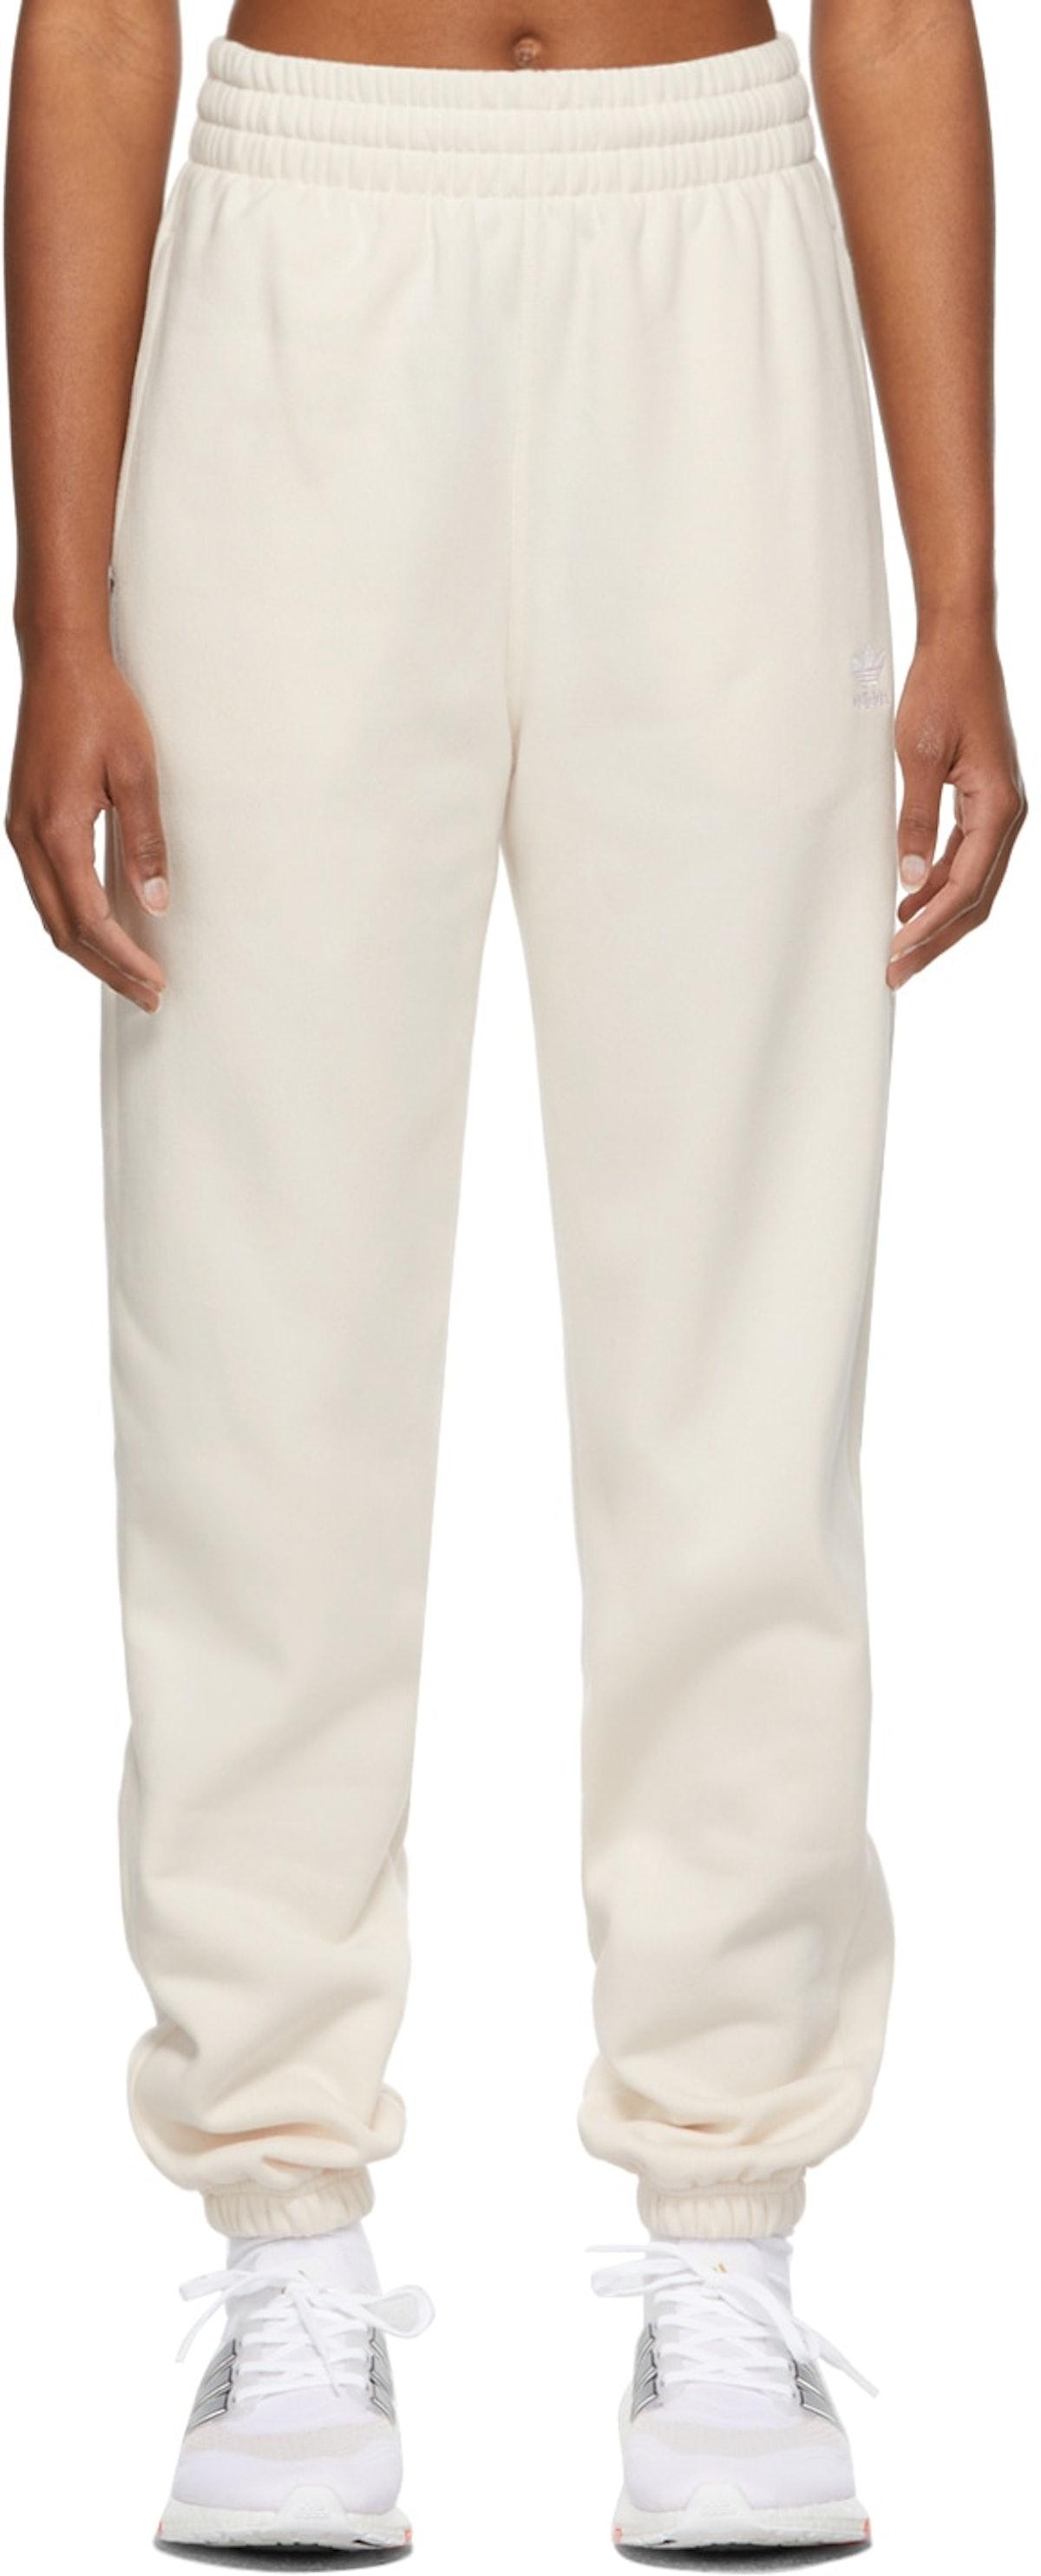 Off-White Fleece Adicolor Essentials Lounge Pants from adidas Originals.